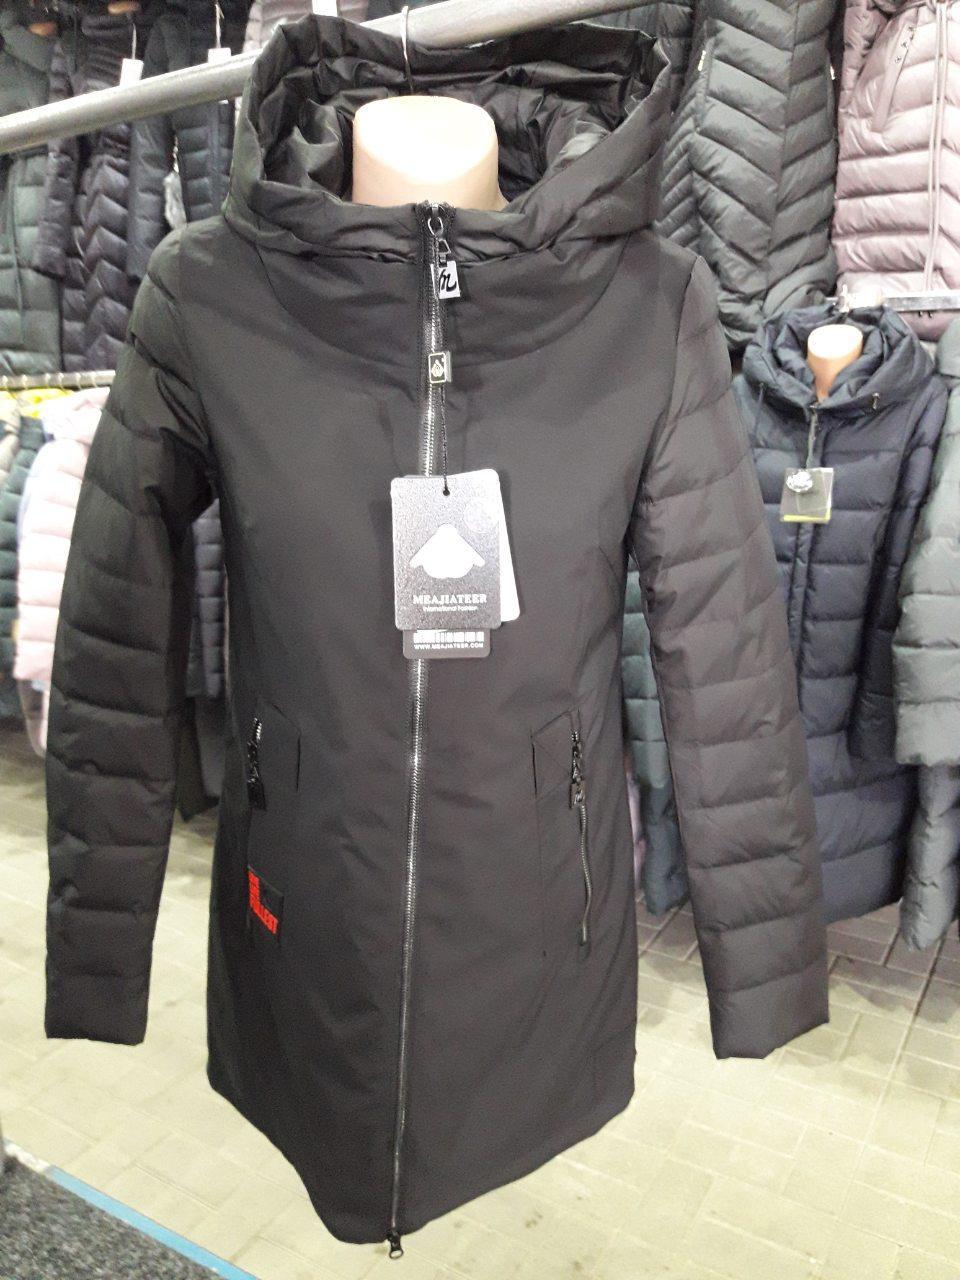 54270e58e78 Женская куртка весна-осень 2019 Meajiateer 01